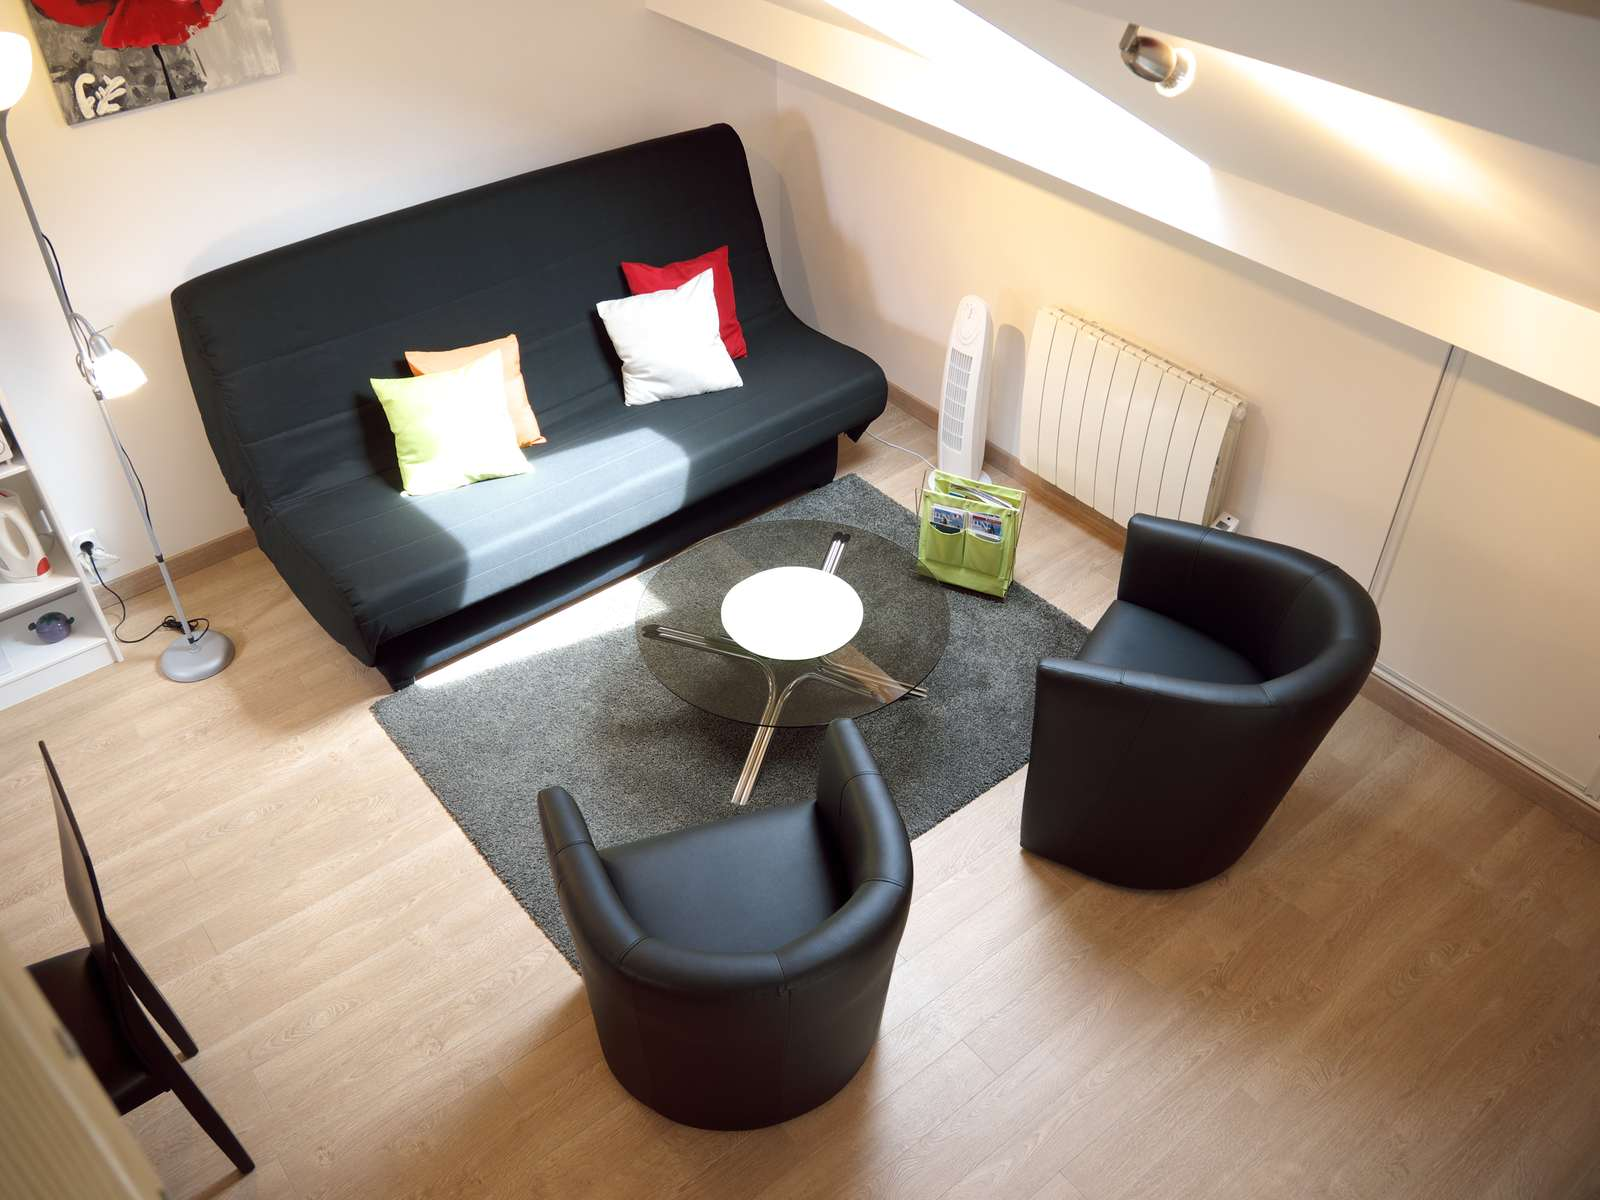 Appartement studio meubl appart h tel g te urbain for Appart hotel dans le 95